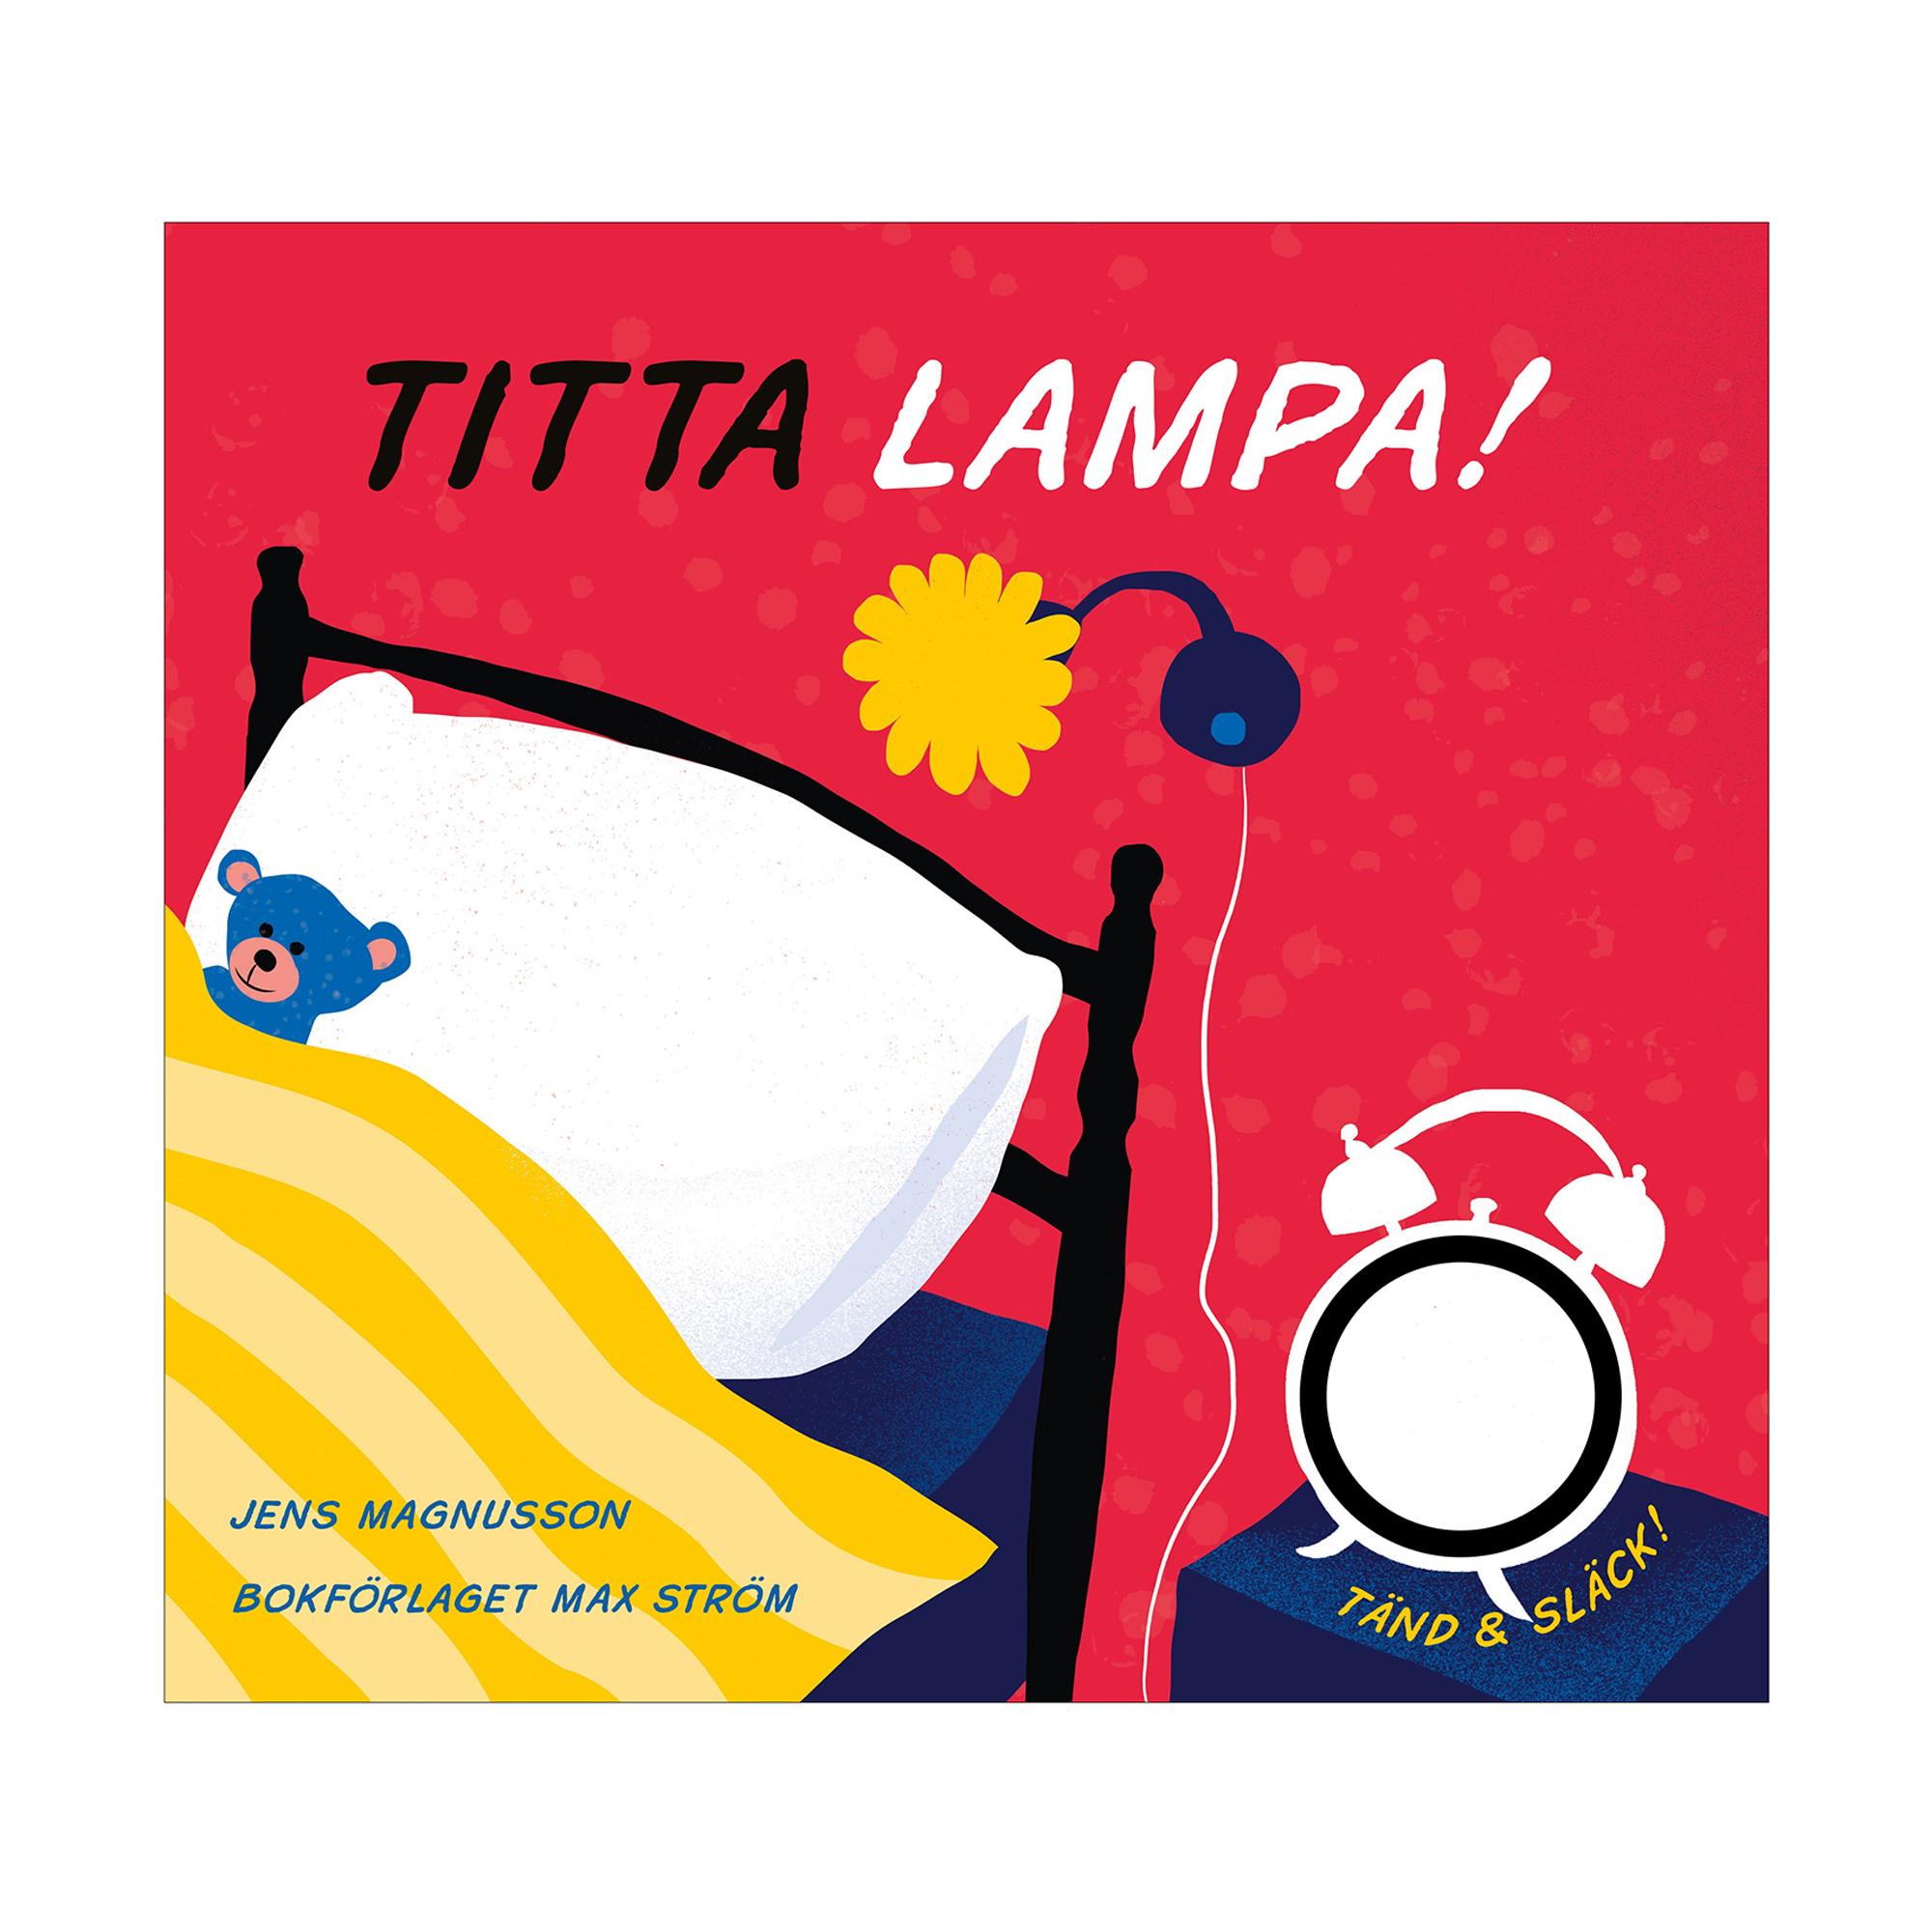 Max Ström Bok Titta lampa!